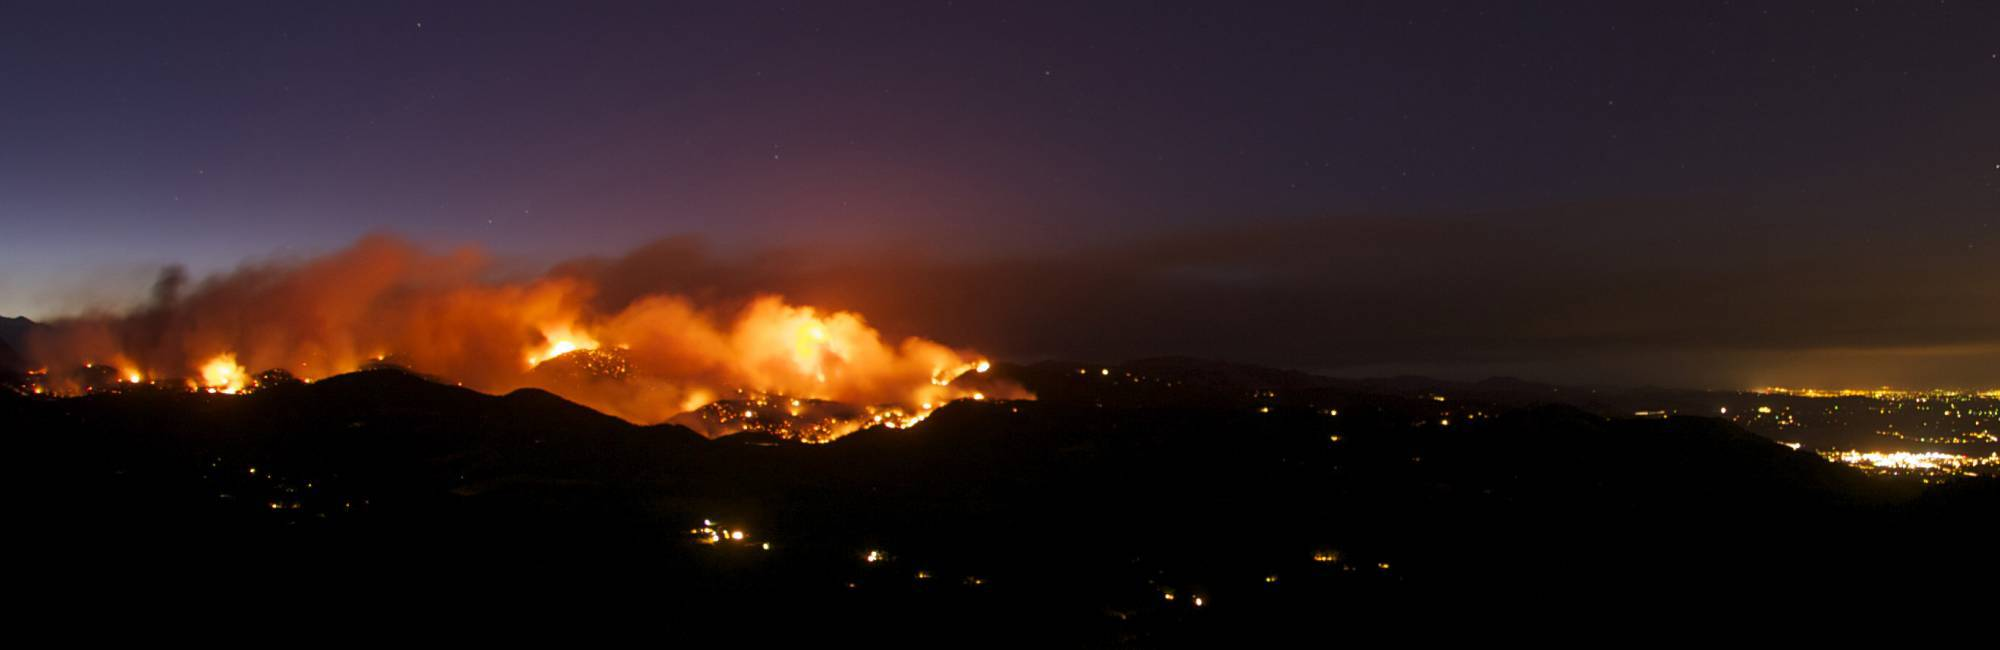 panorama of the Fourmile Canyon fire above Boulder, Colorado